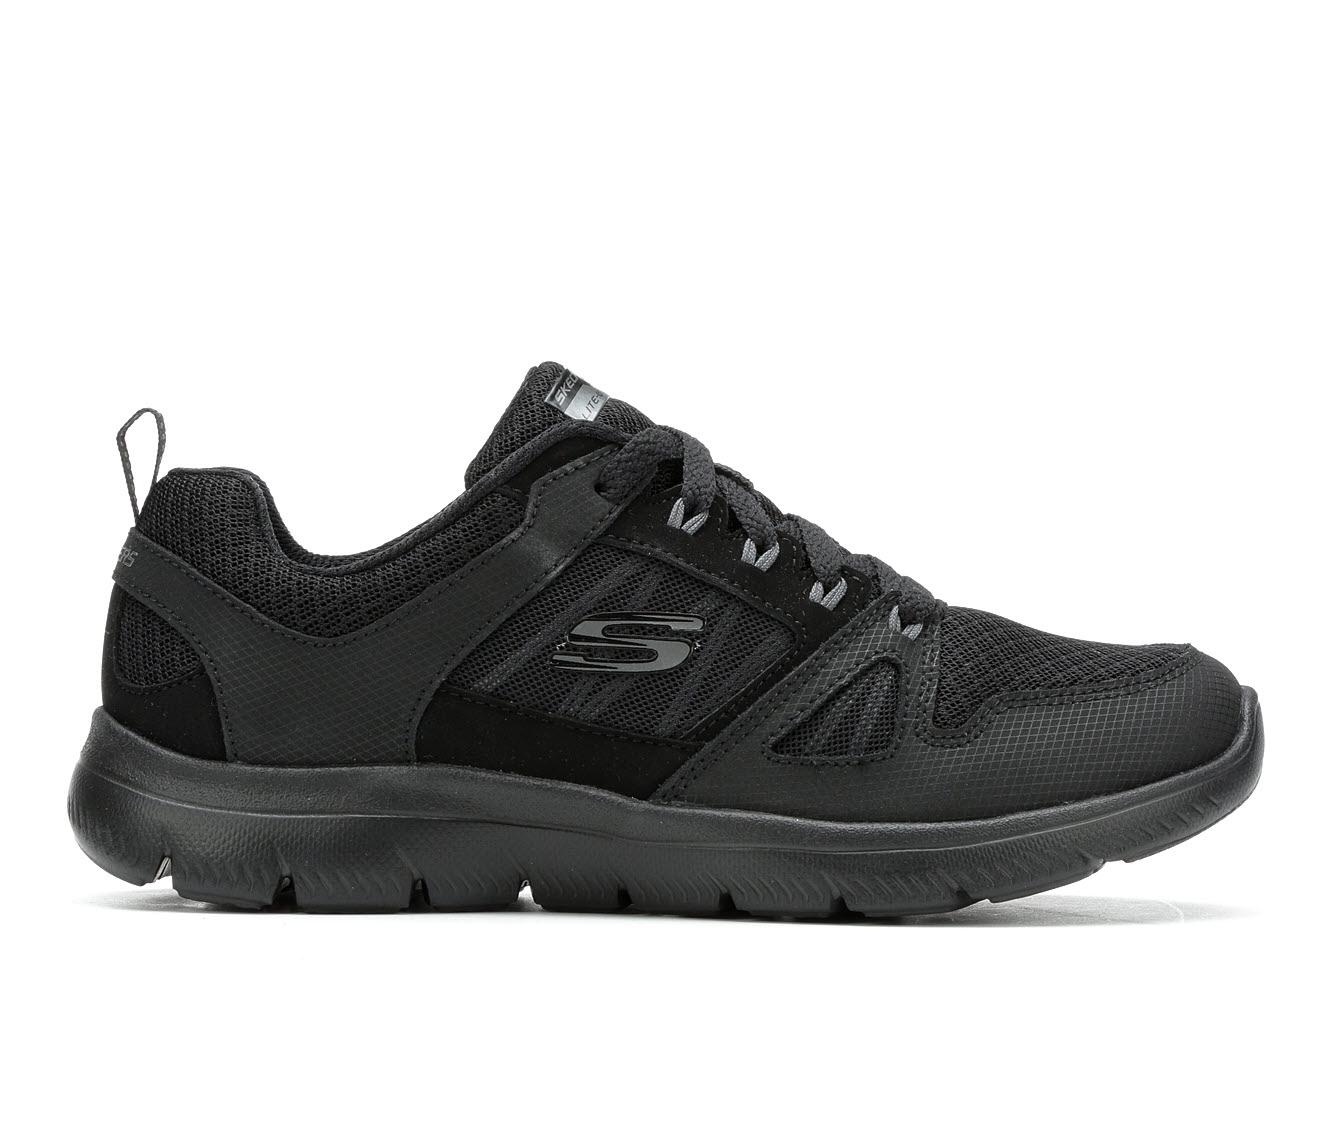 Skechers New World 12997 Women's Athletic Shoe (Black)